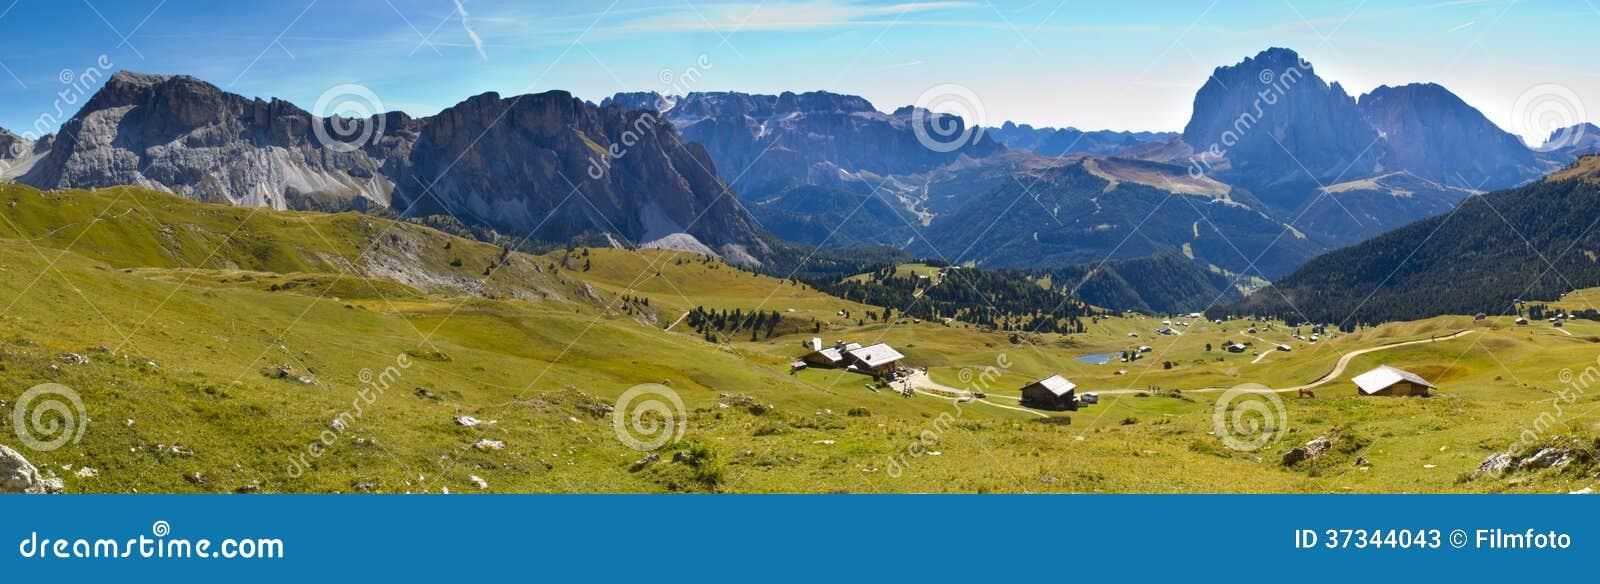 Panorama of alps dolomites